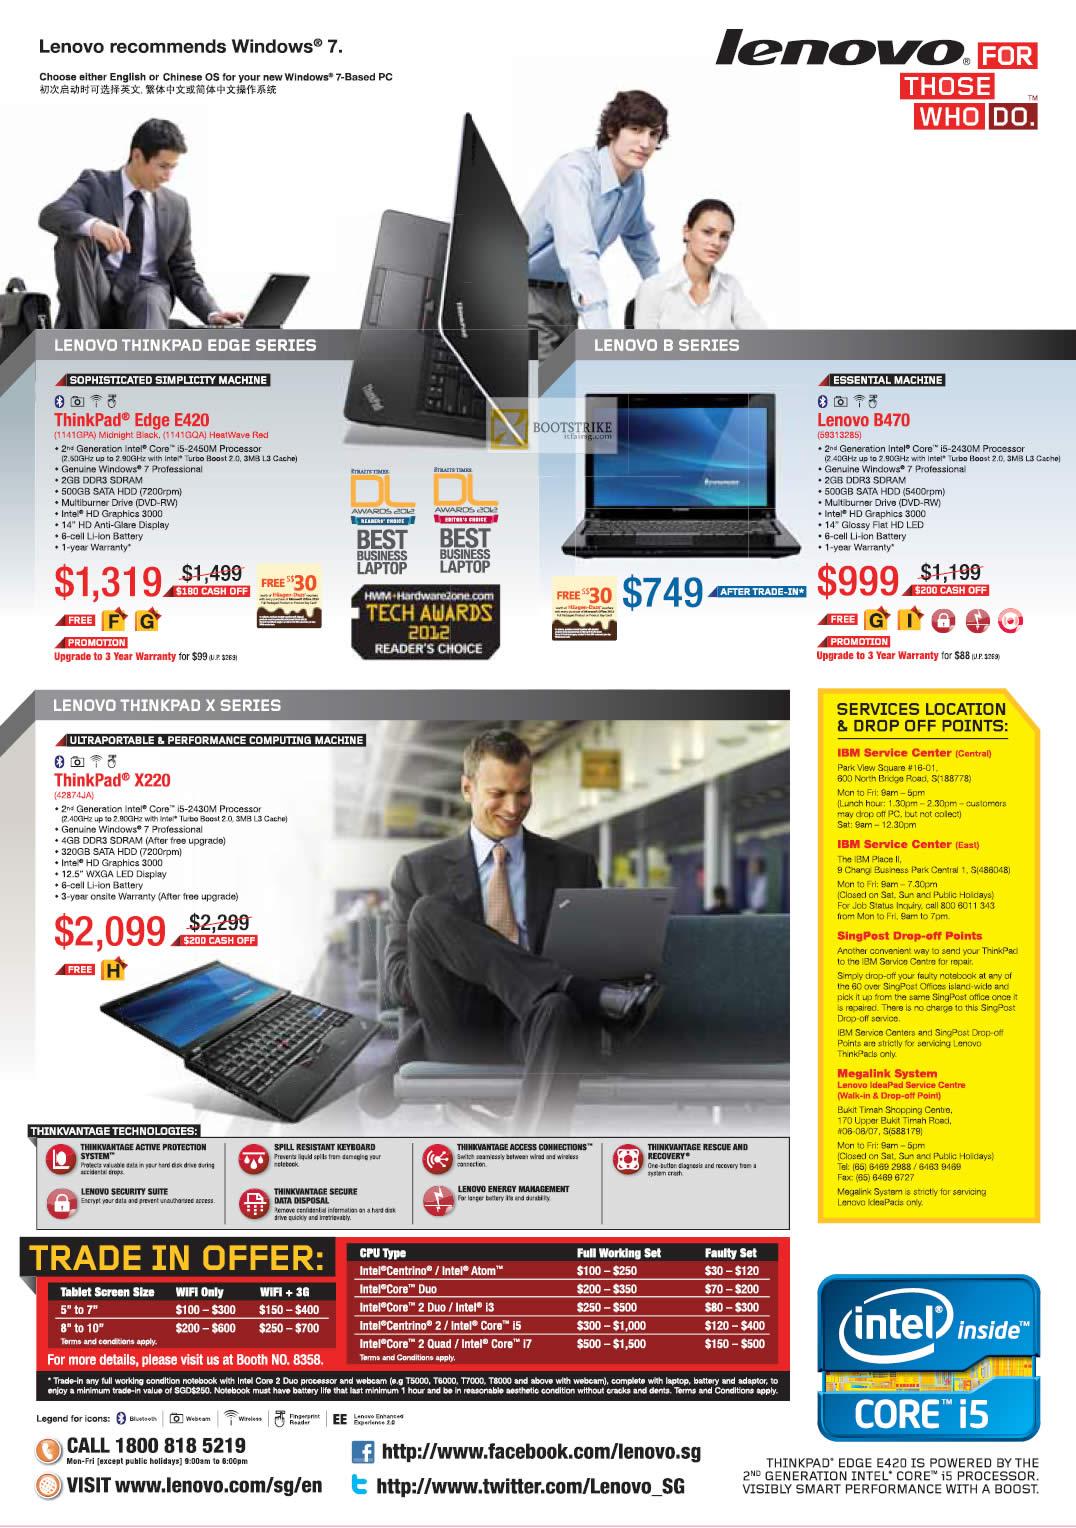 IT SHOW 2012 price list image brochure of Lenovo Notebooks Thinkpad Edge E420, B470, X220, Trade In